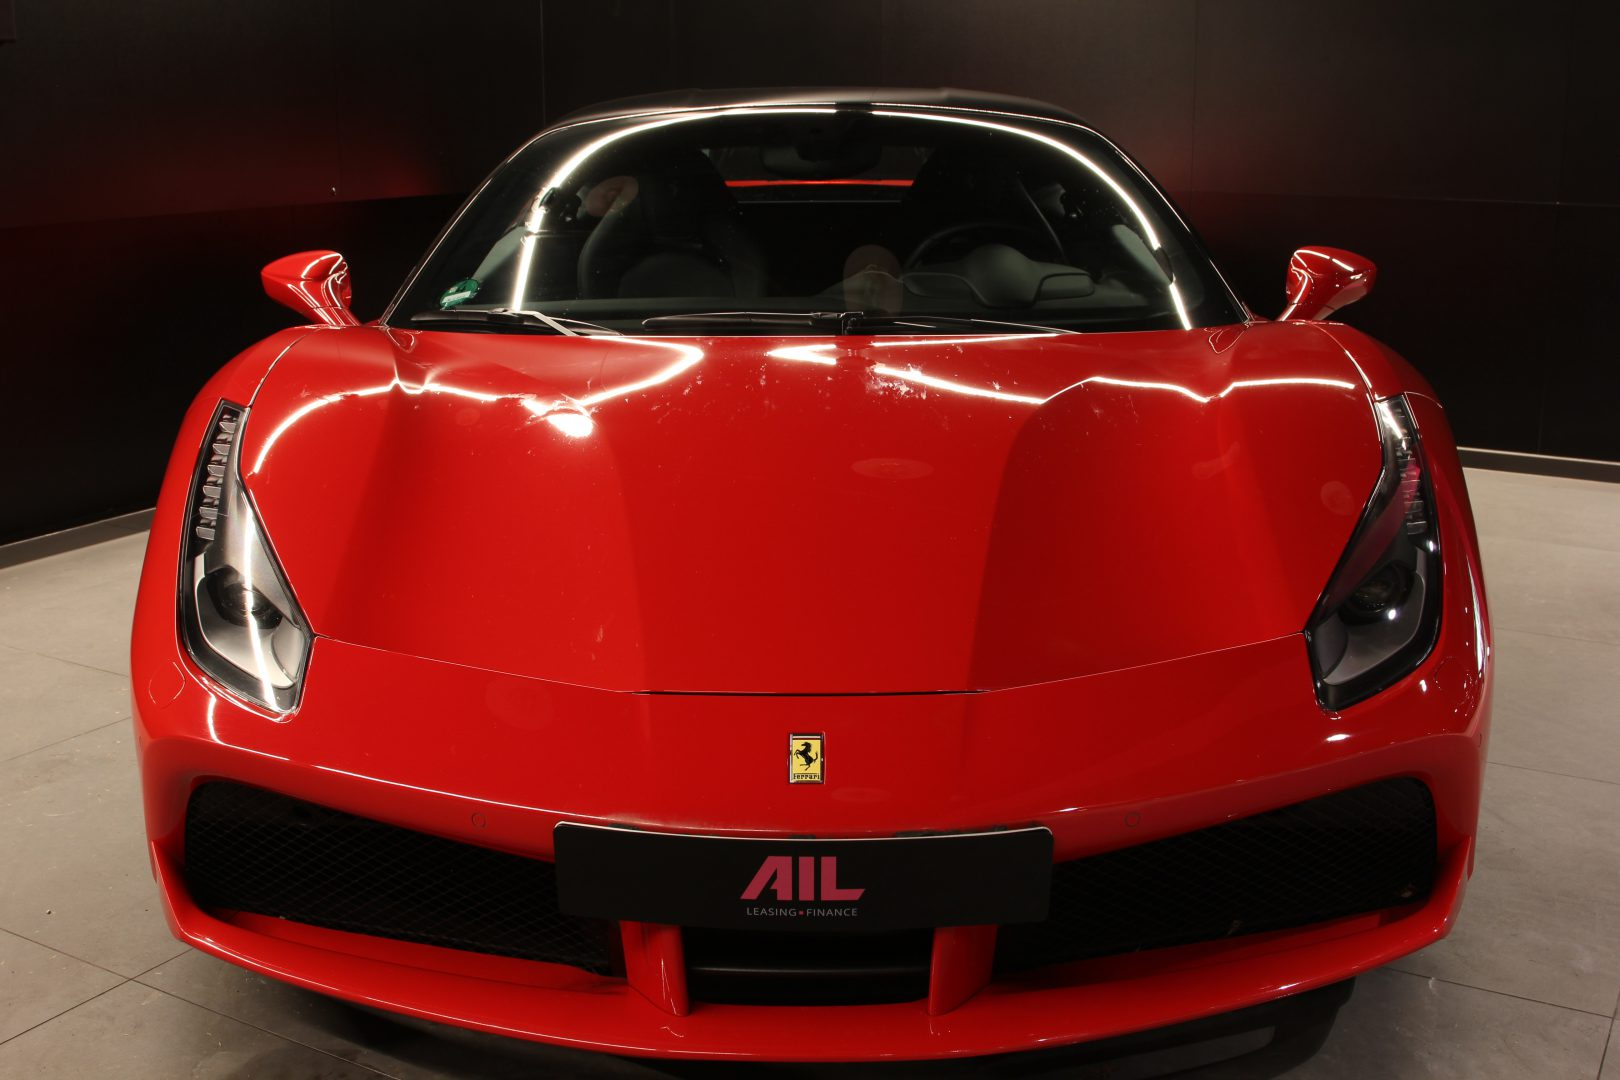 AIL Ferrari 488 GTB Rosso Corsa 5